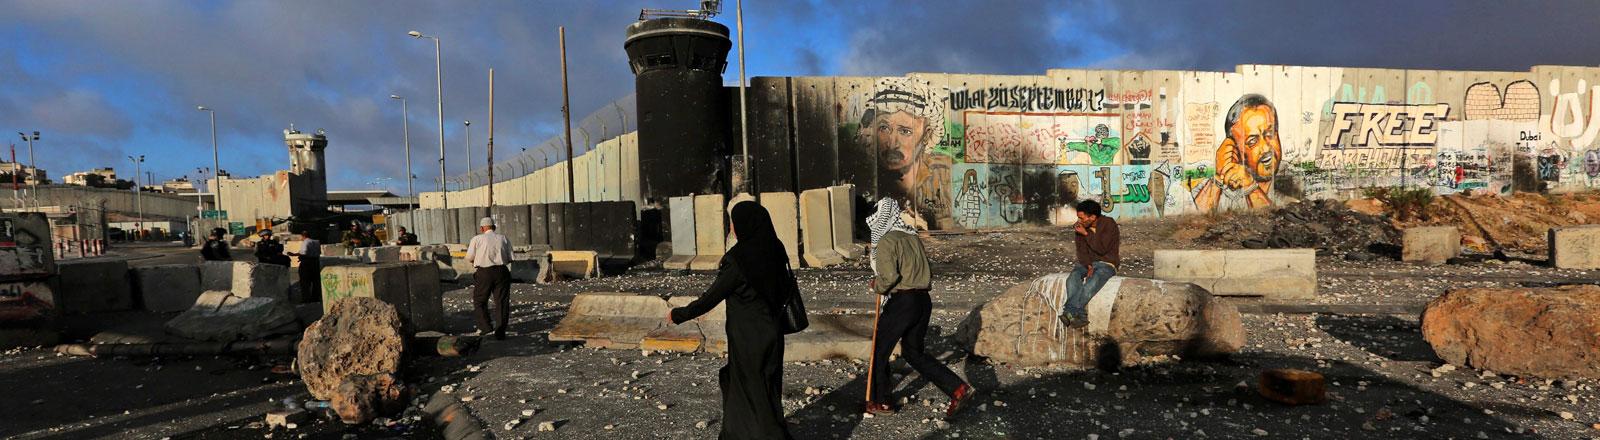 Der Kalandia-Checkpoint in Ramallah. Hier muss man passieren, um nach Jerusalem zu kommen.